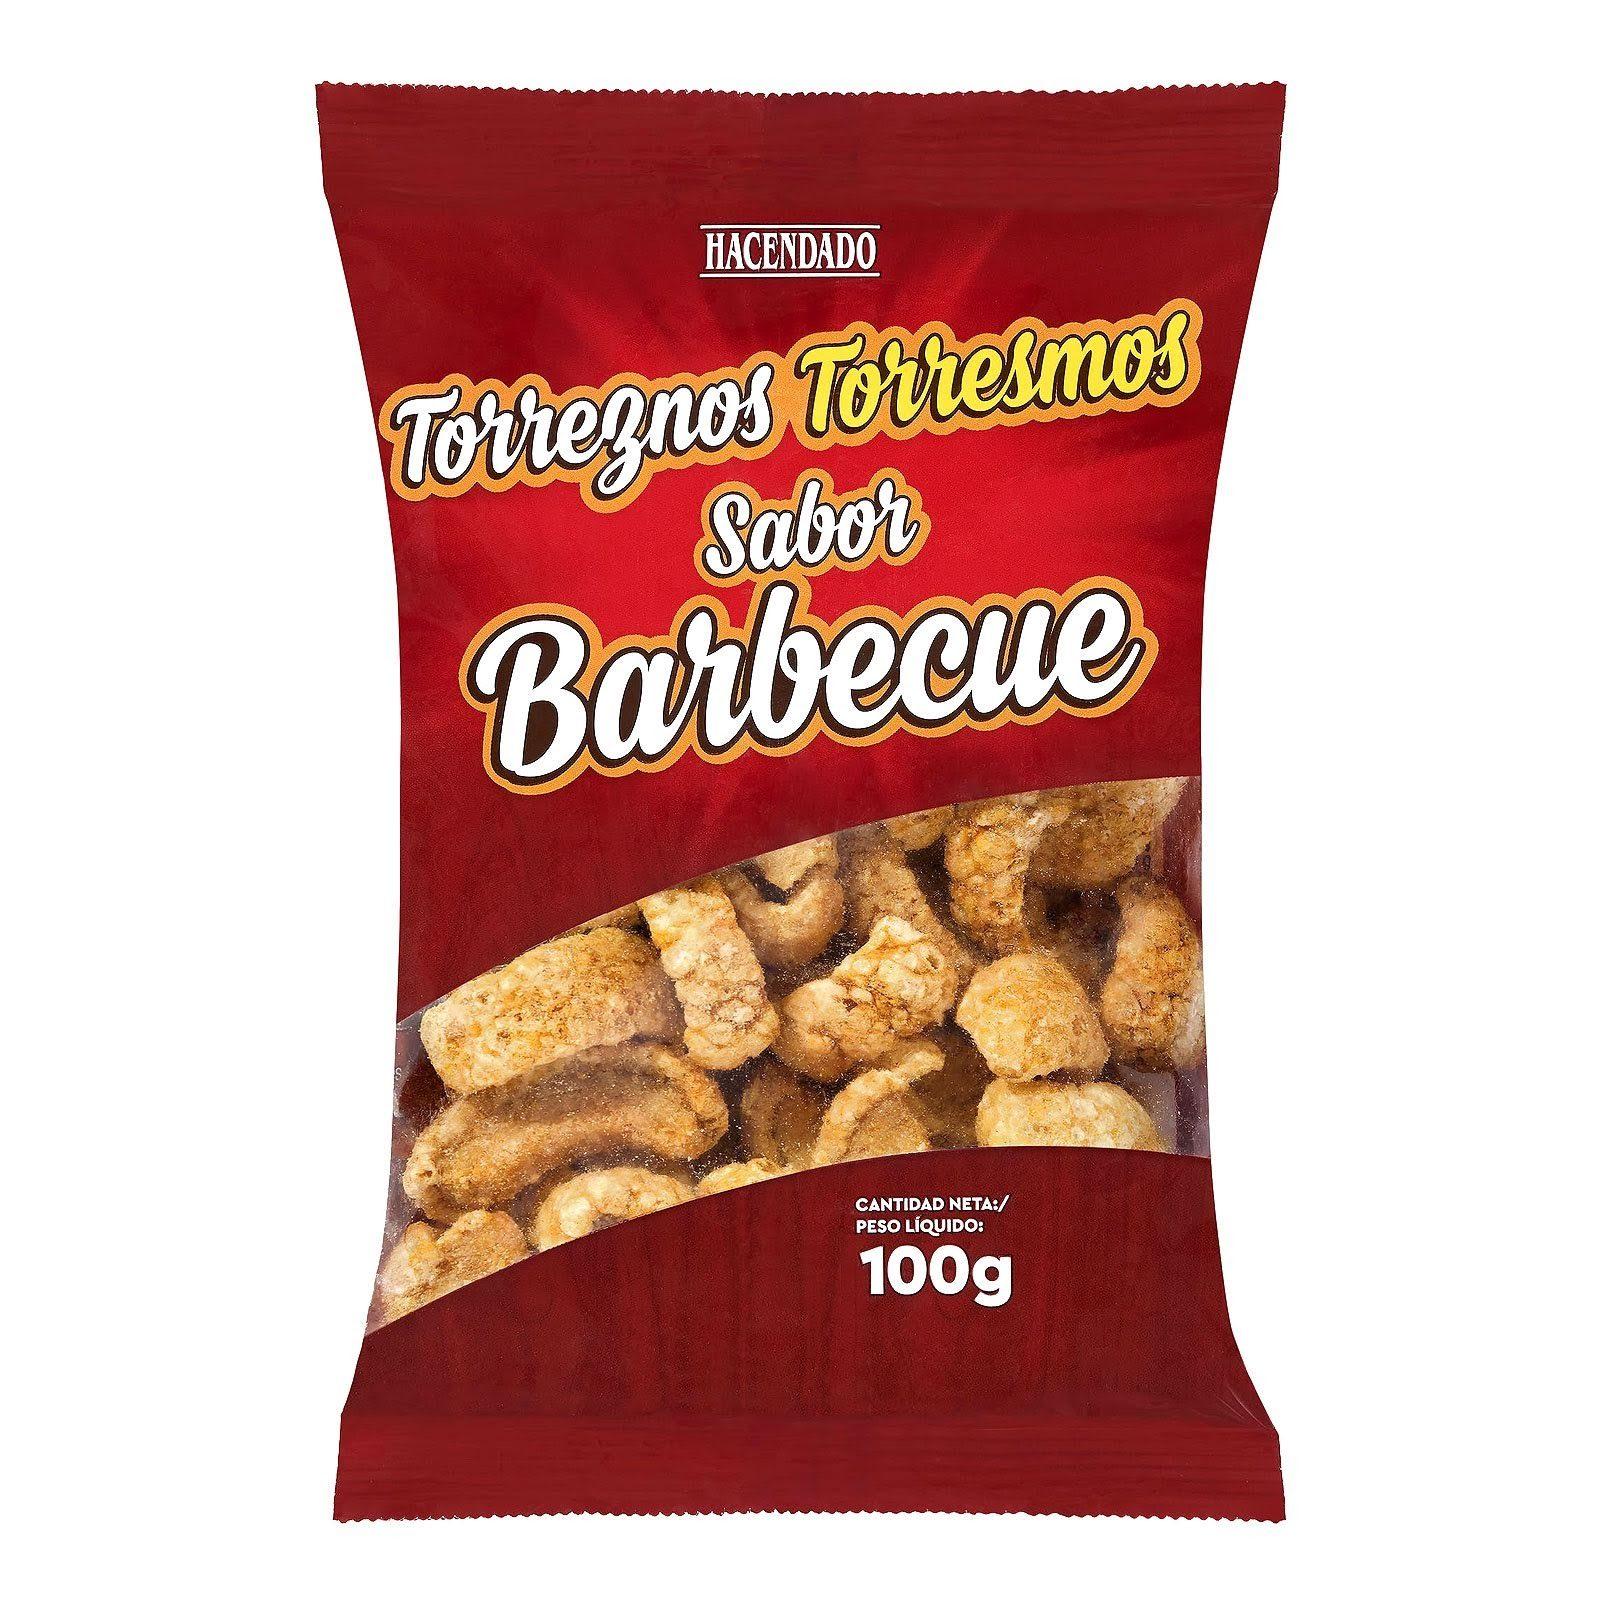 torreznos-de-cerdo-sabor-barbacoa-hacendado-mercadona-1-6790743